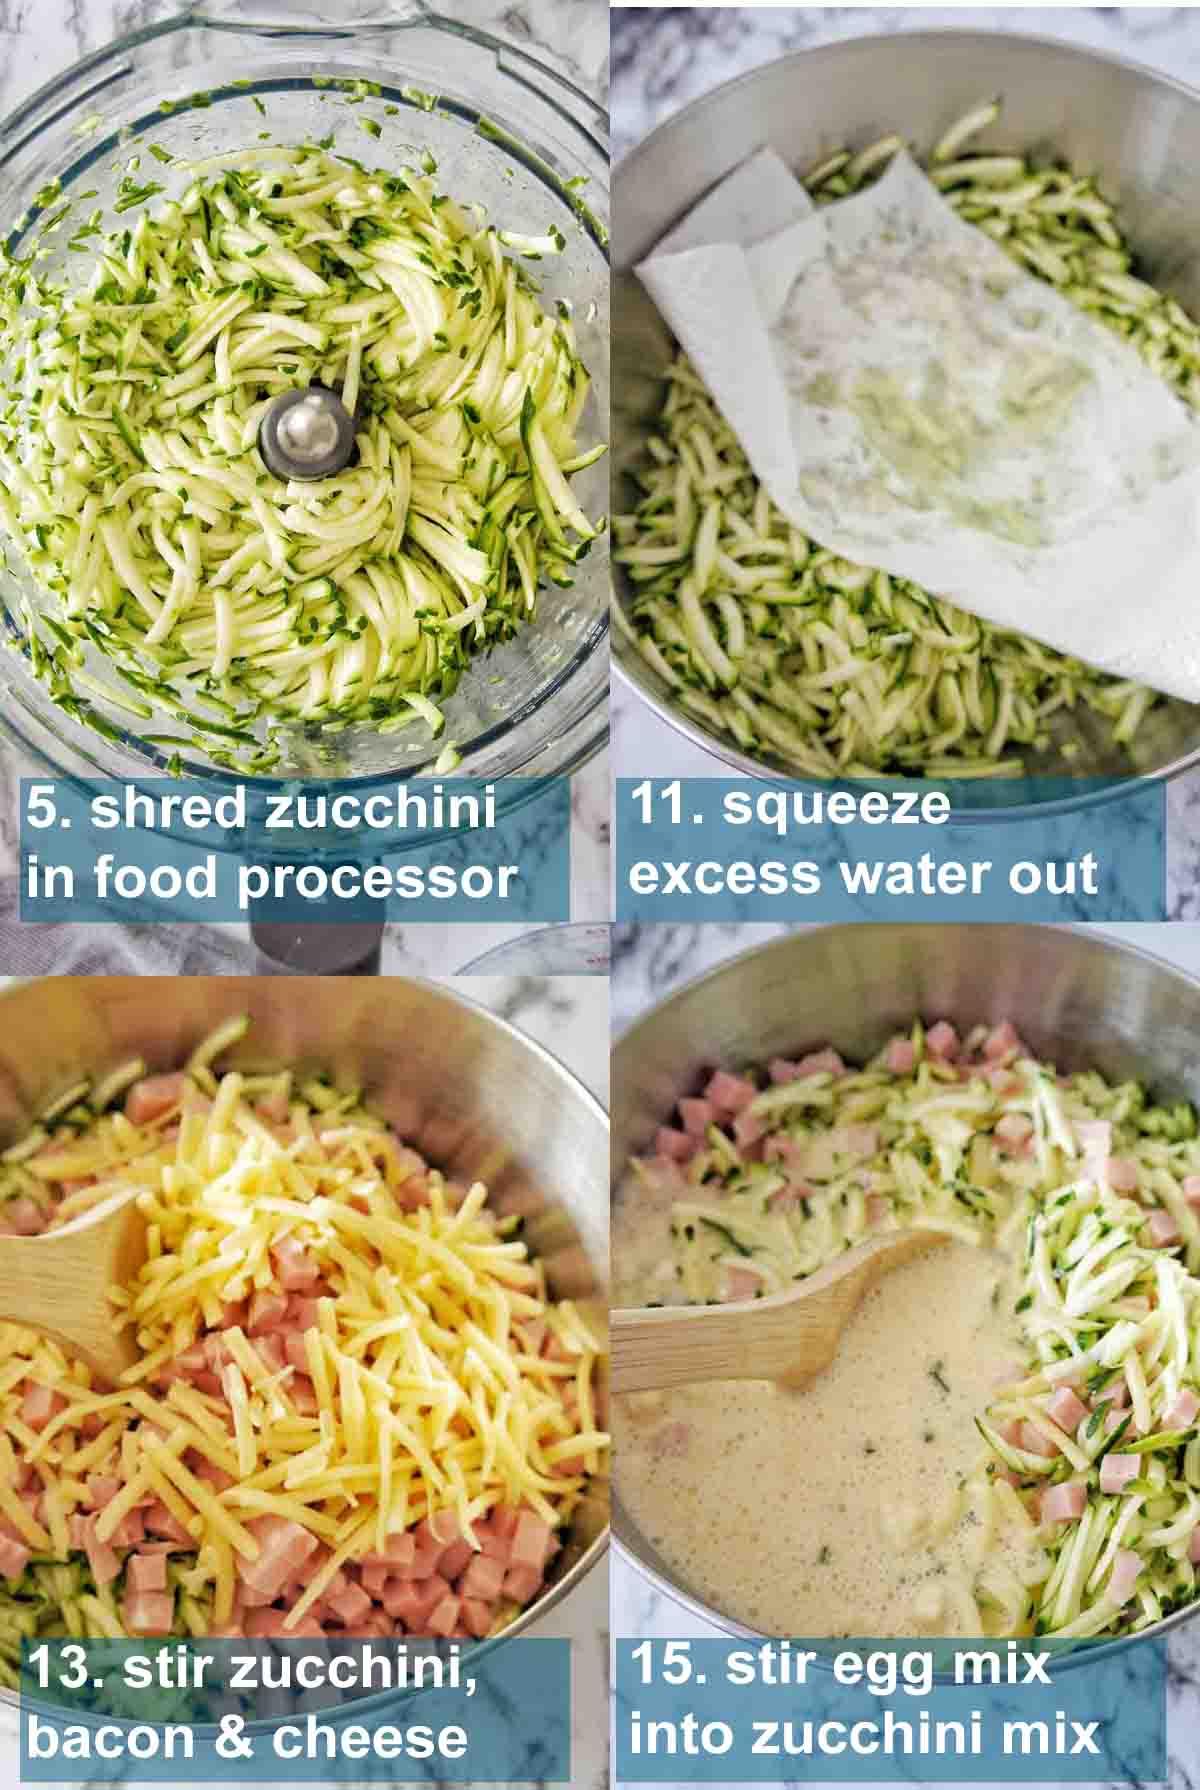 Zucchini Slice method with text overlay